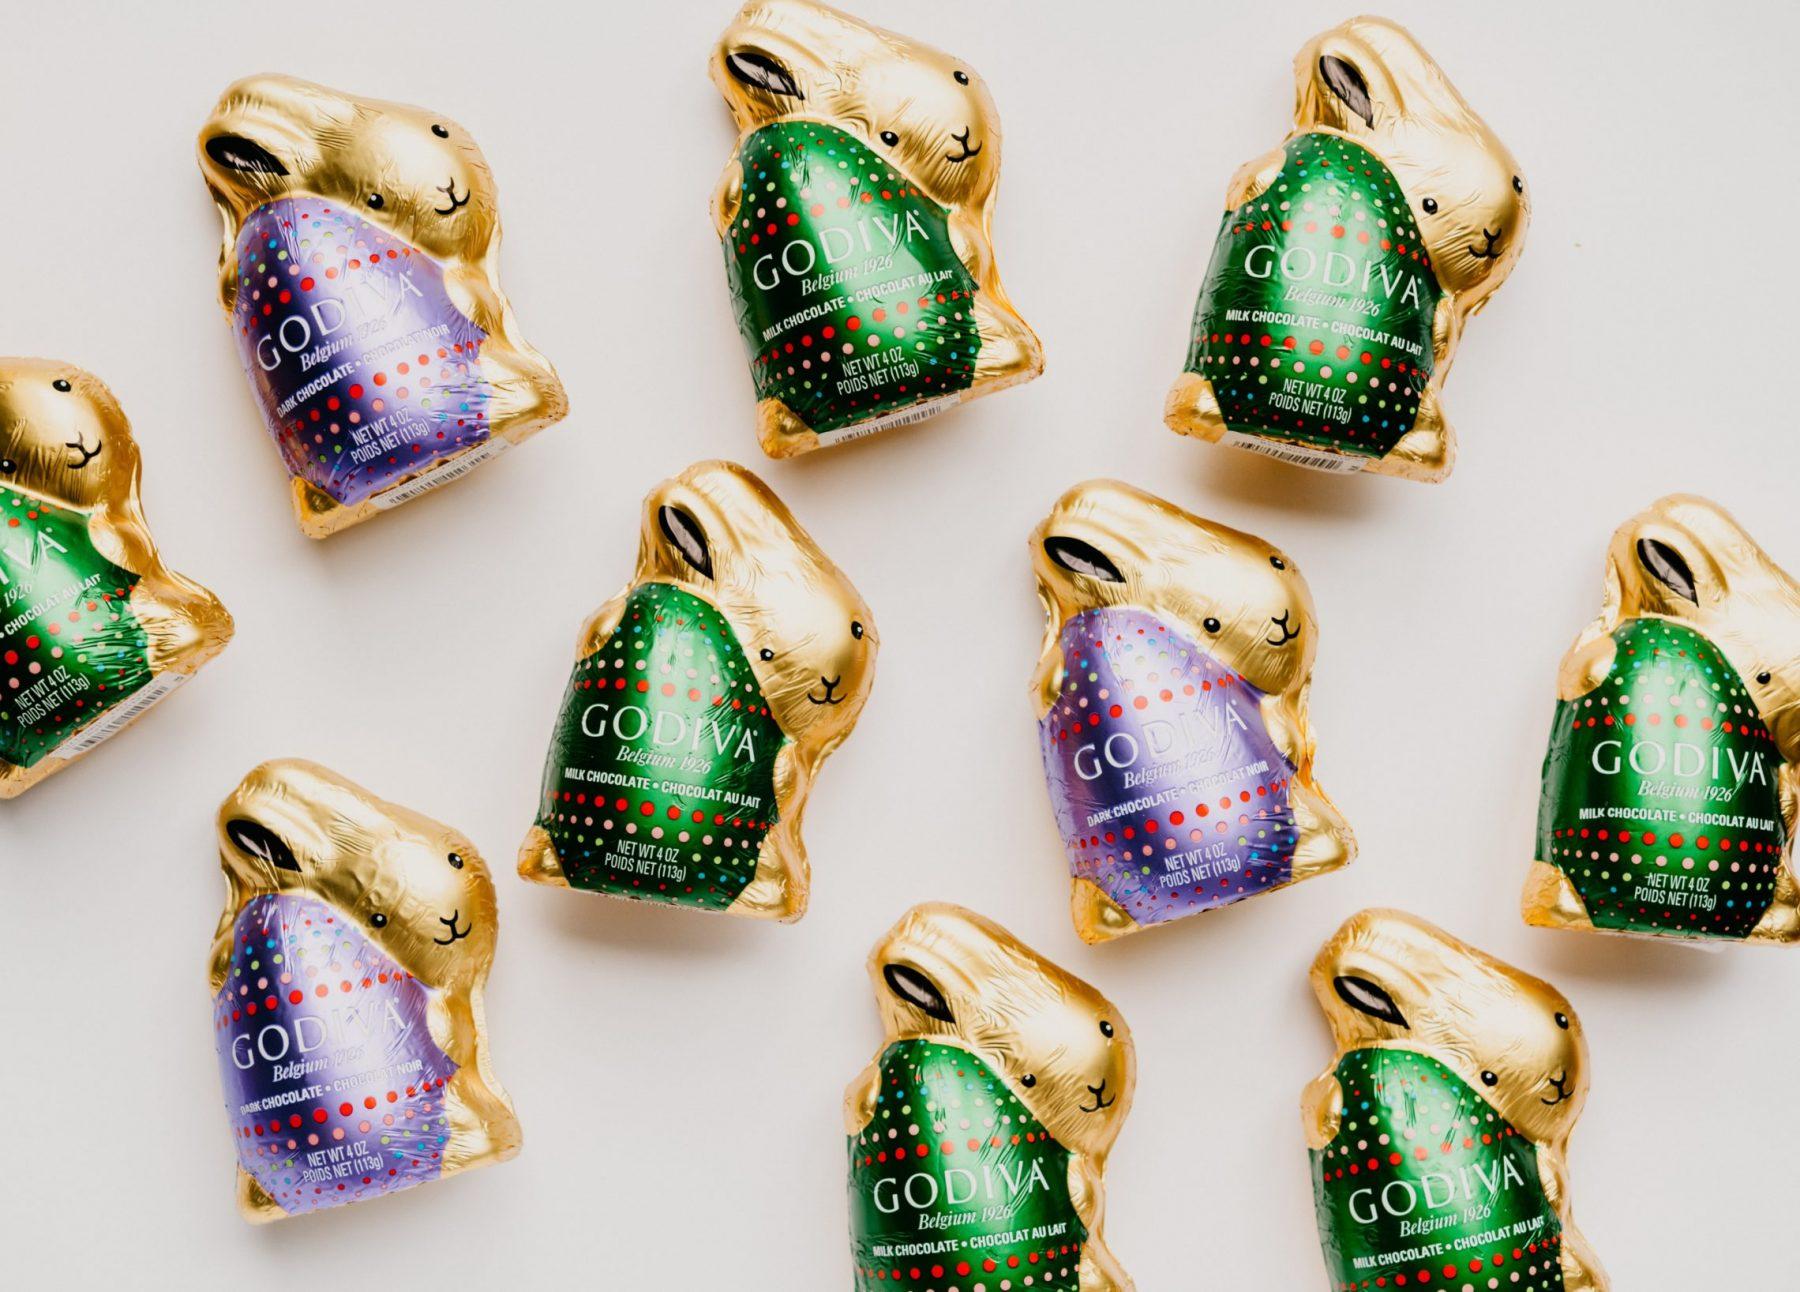 Godiva chocolate bunnies for gourmet easter basket